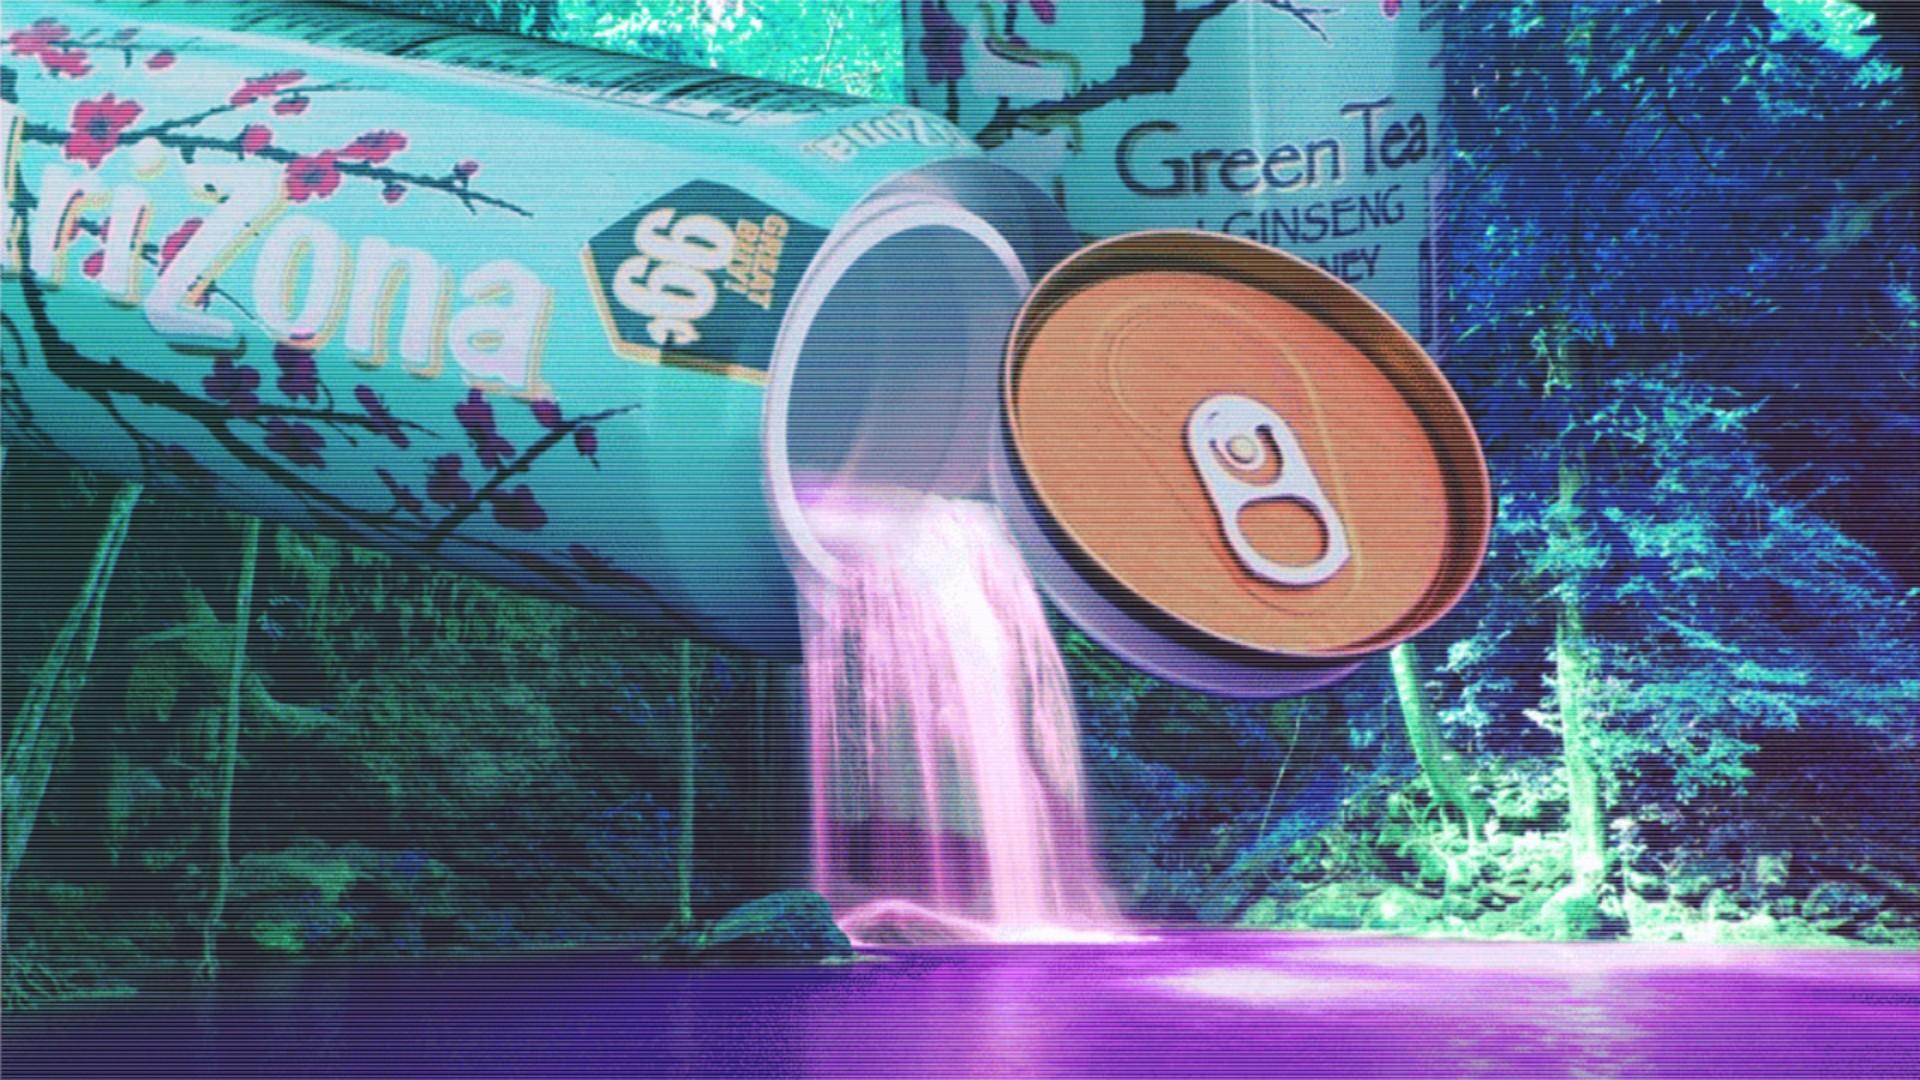 vaporwave wallpaper download free stunning full hd wallpapers